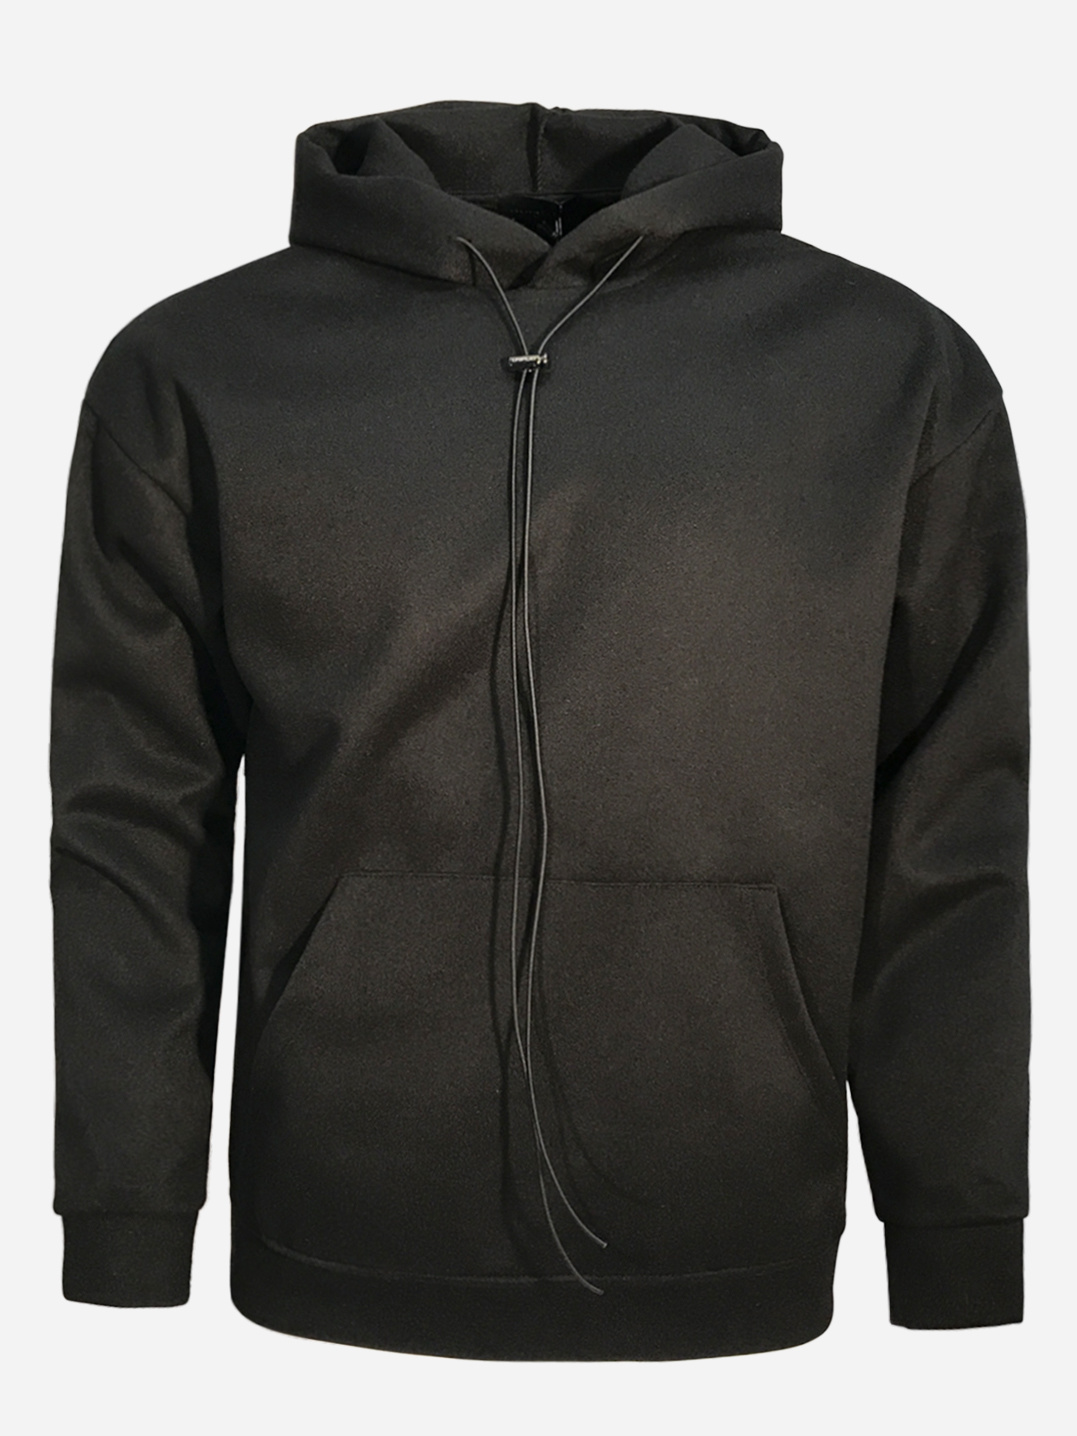 Arya Boy SweaterUy458 Black Maat: 2XL